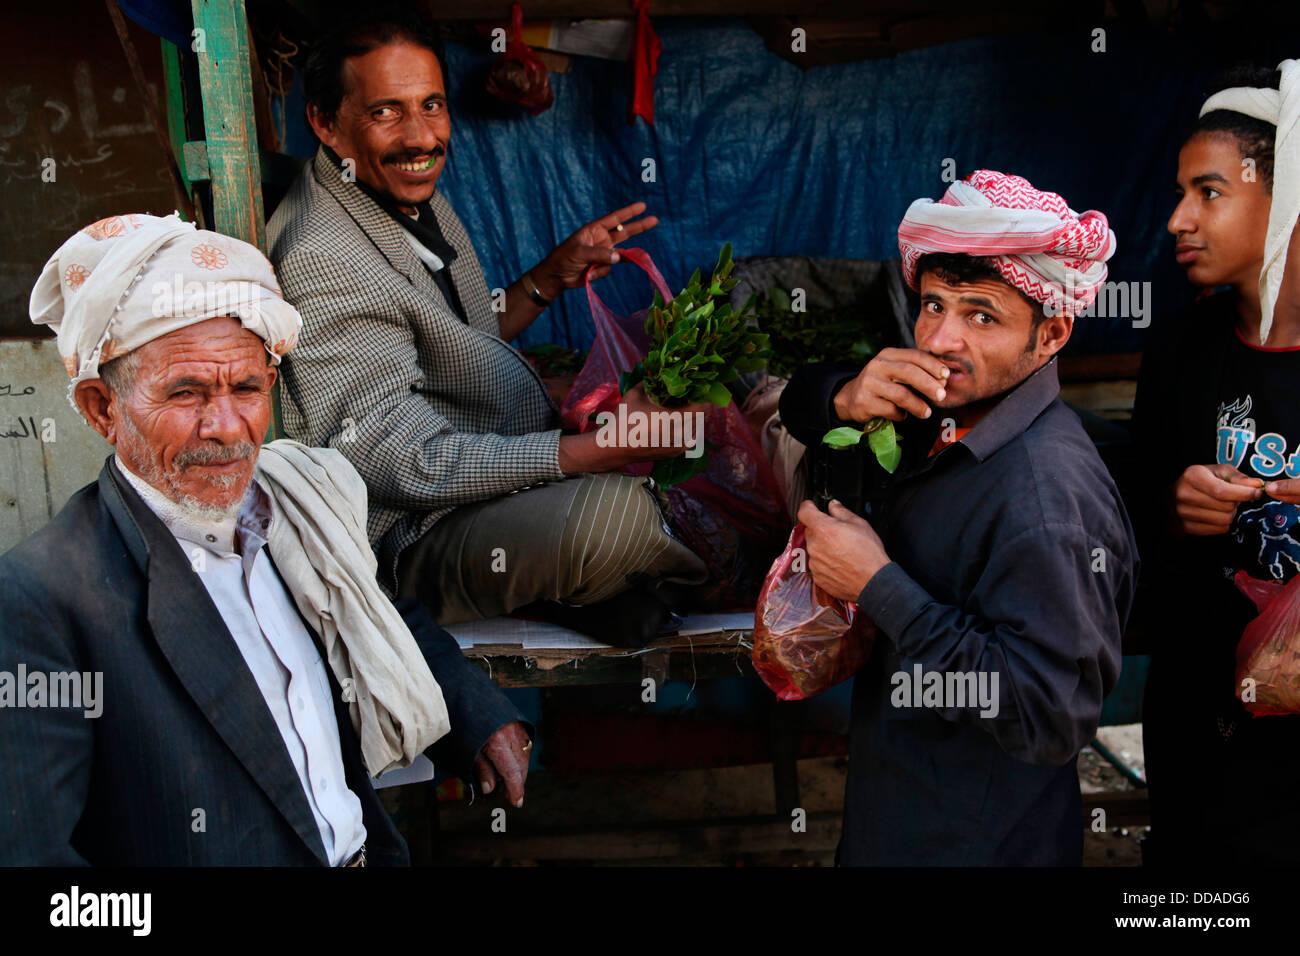 Kaht vendor in Sana'a, Yemen. - Stock Image